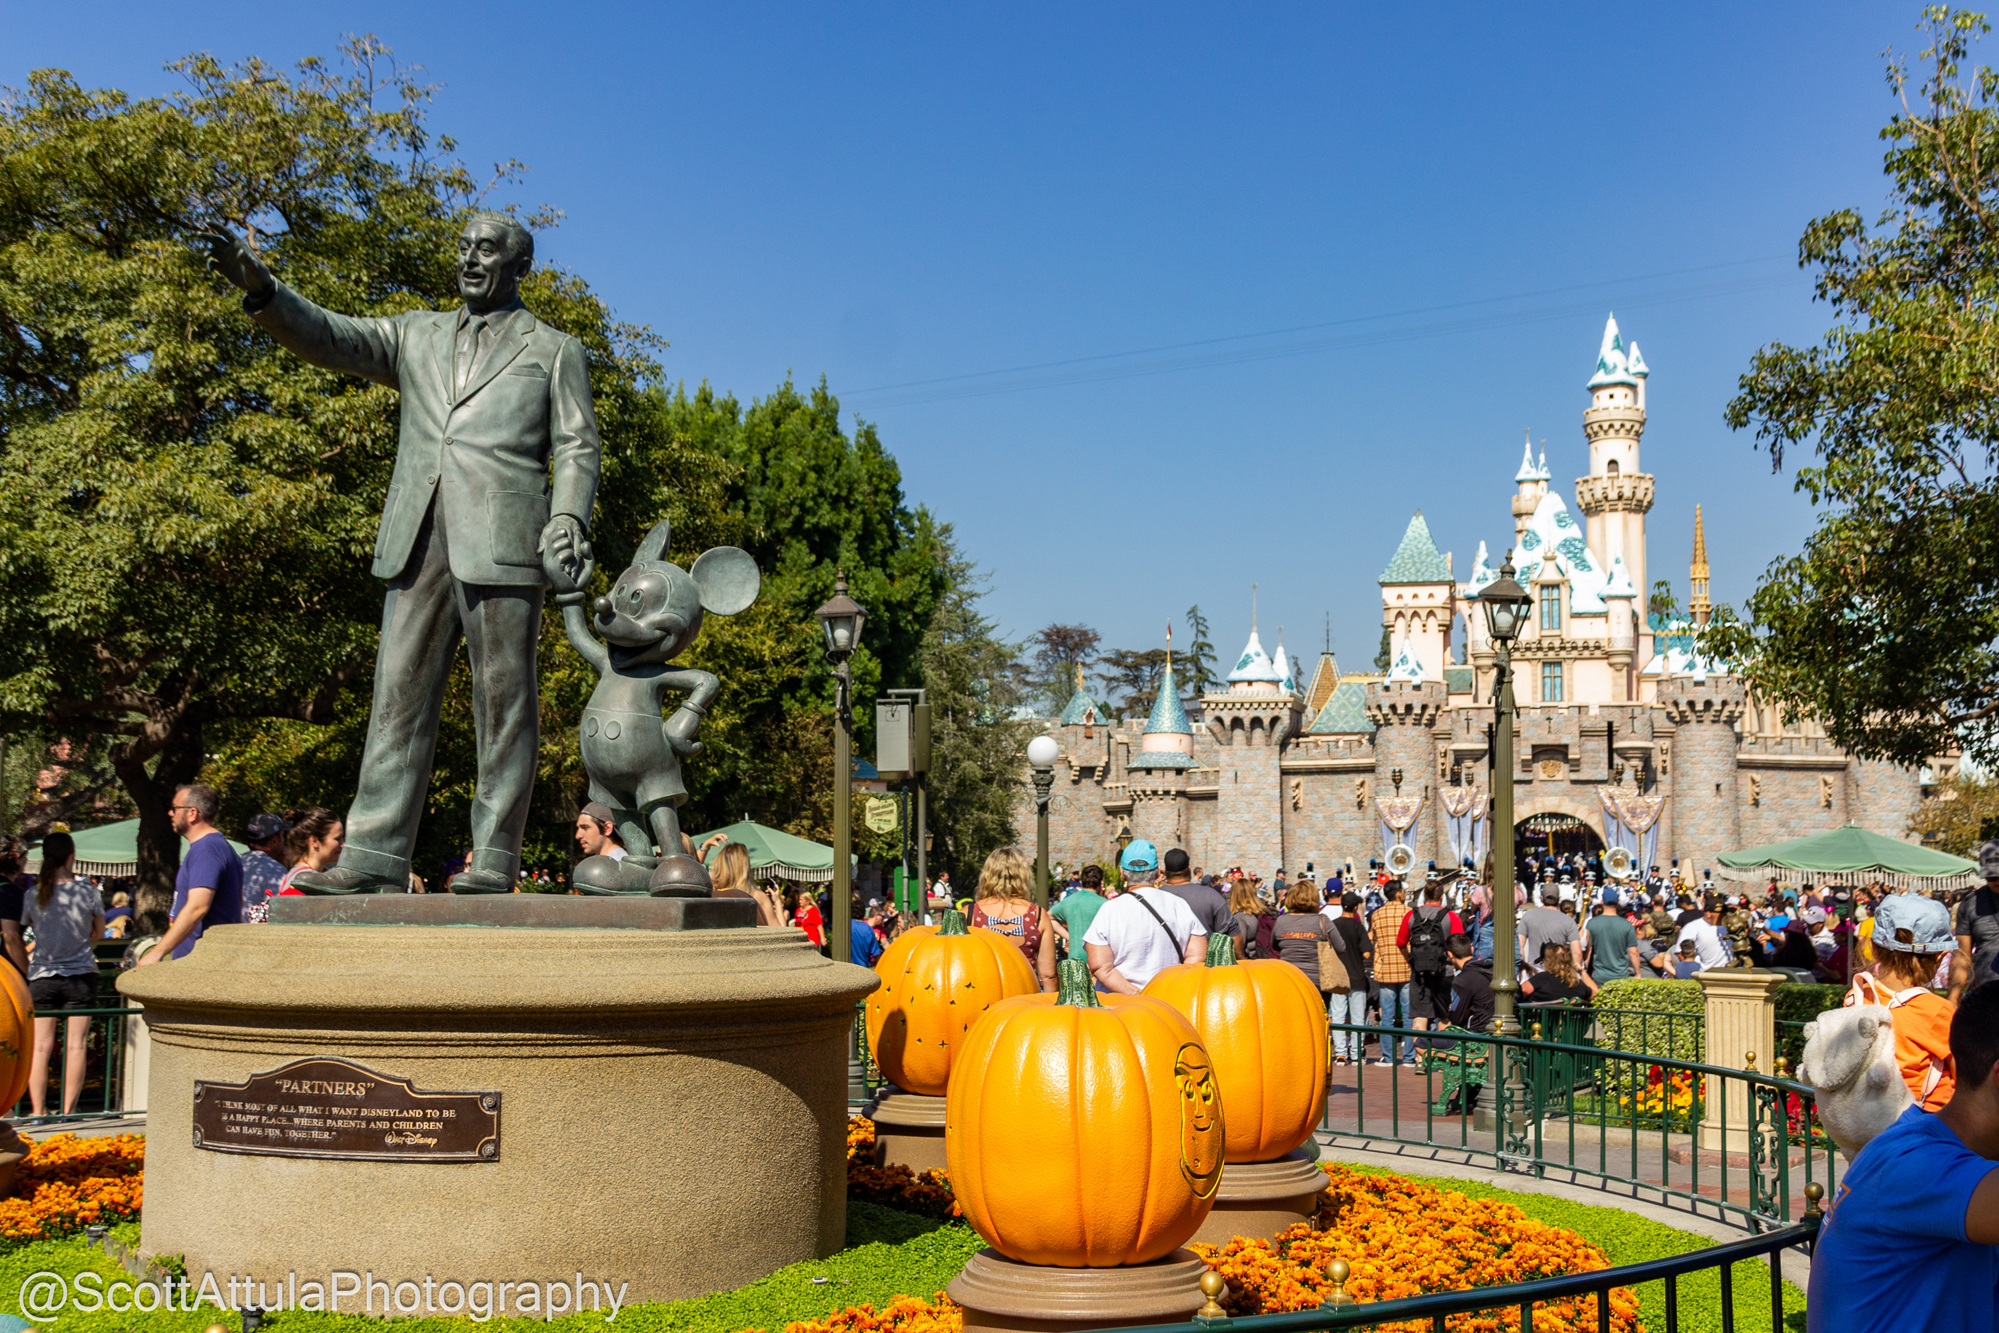 Christmas At Disneyland.Micechat Disneyland Resort Features Disneyland Update